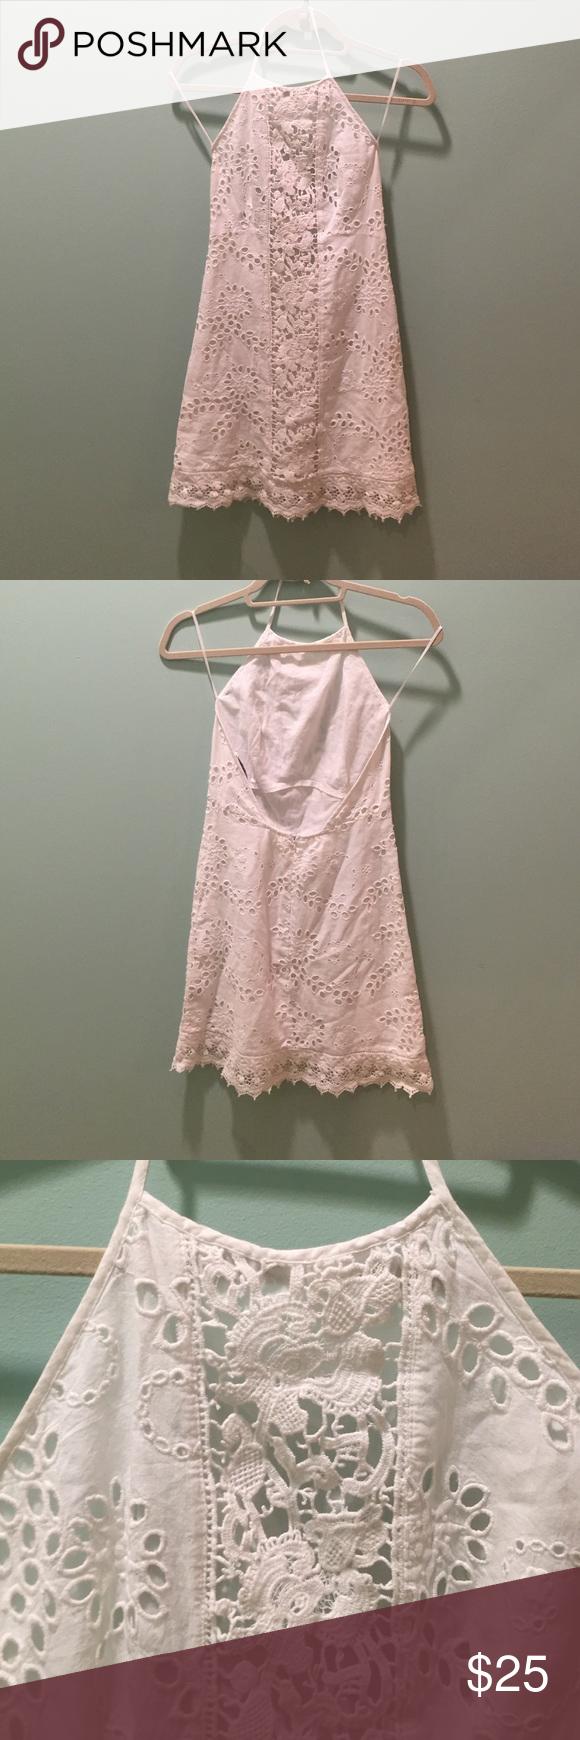 White lace dress zara  Zara dress  My Posh Closet  Pinterest  Lace summer dresses Zara